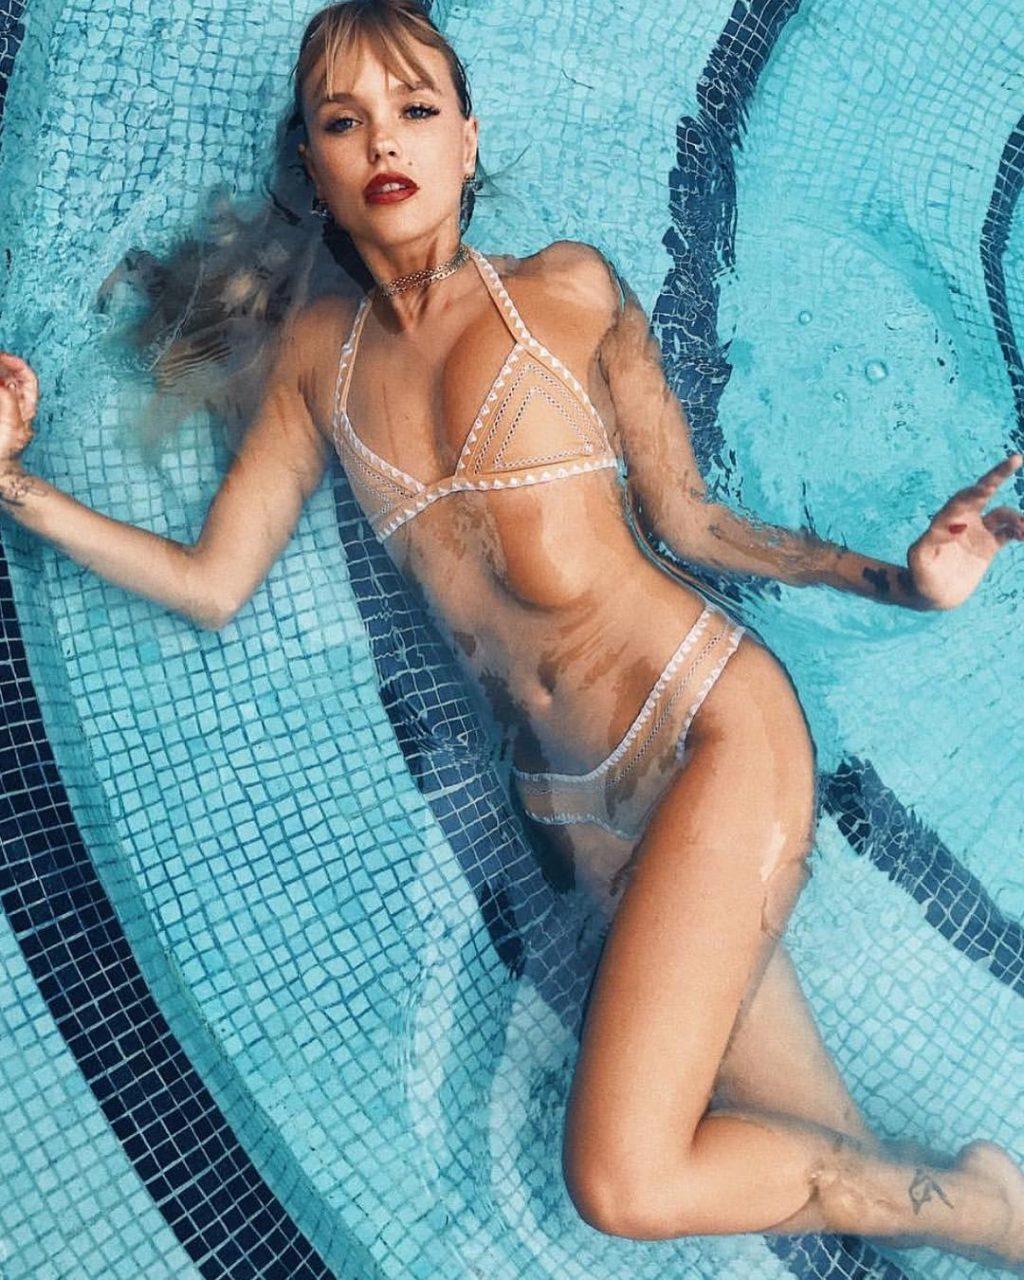 Marissa everhart nude nudes (61 pics)